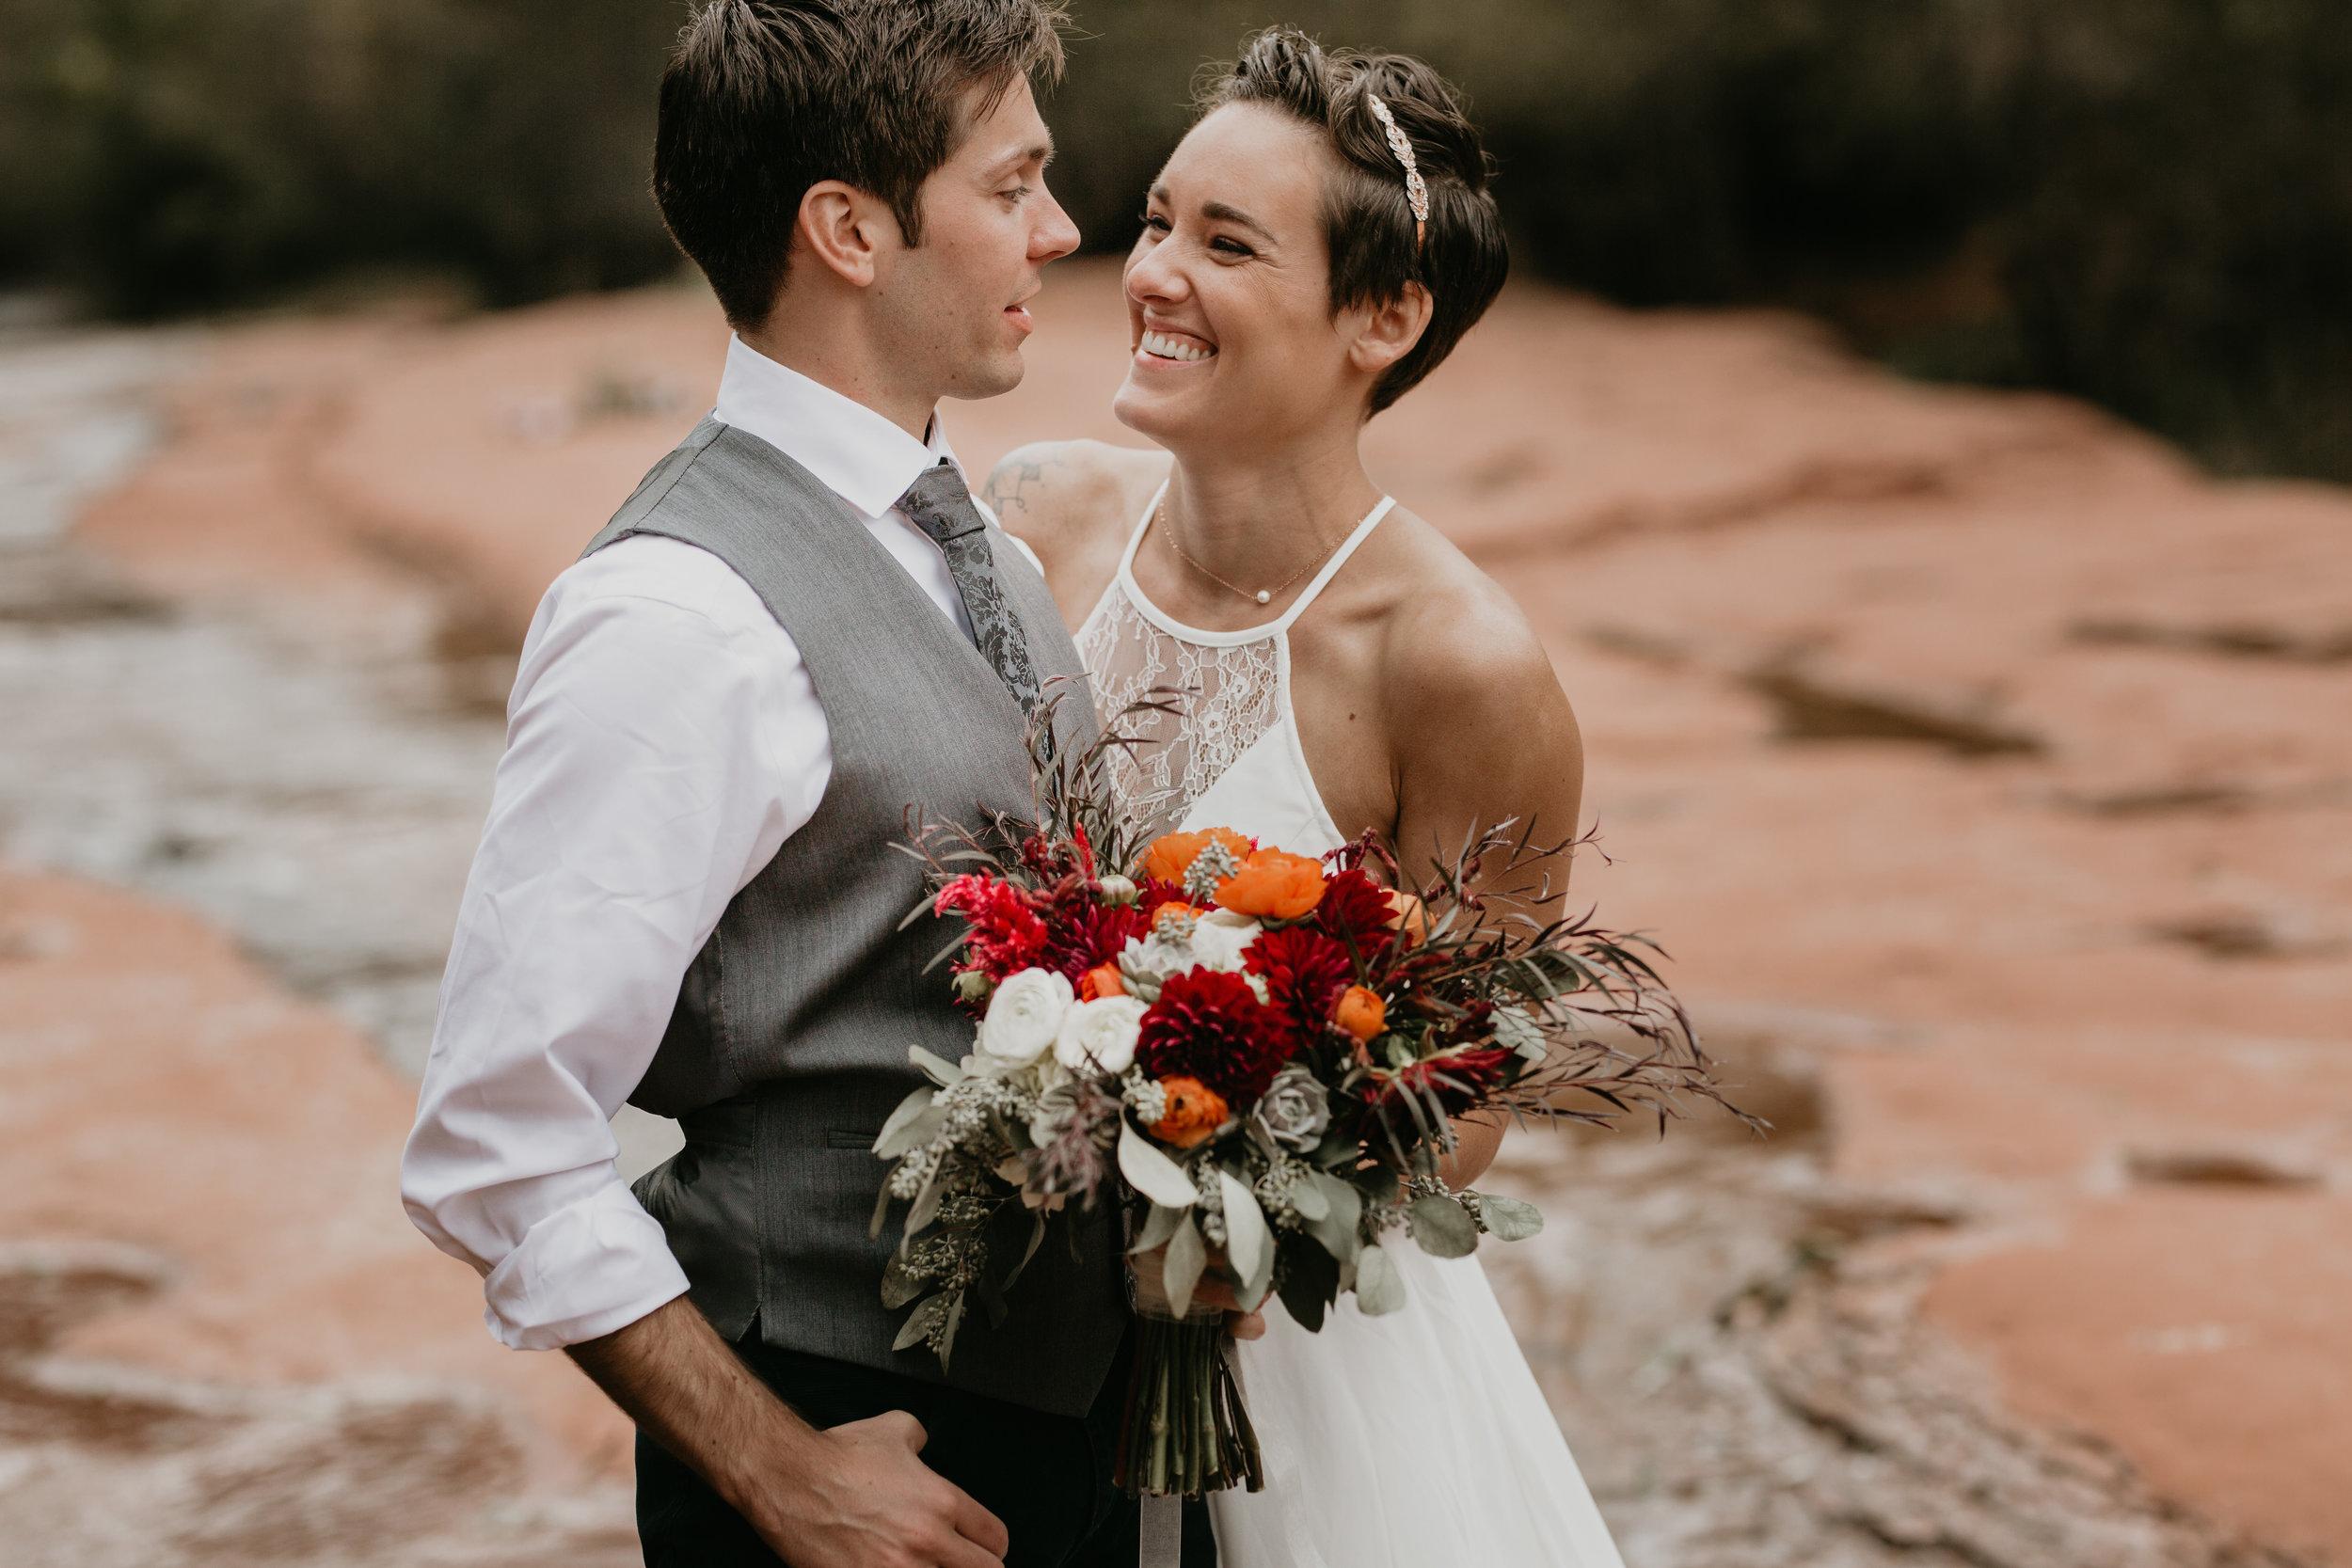 nicole-daacke-photography-sedona-arizona-destination-elopement-wedding-photographer-catherdral-rock-hiking-elopement-sedona-river-elopement-photos-desert-rock-wedding-photographer-laid-back-spontaneous-elopement-108.jpg